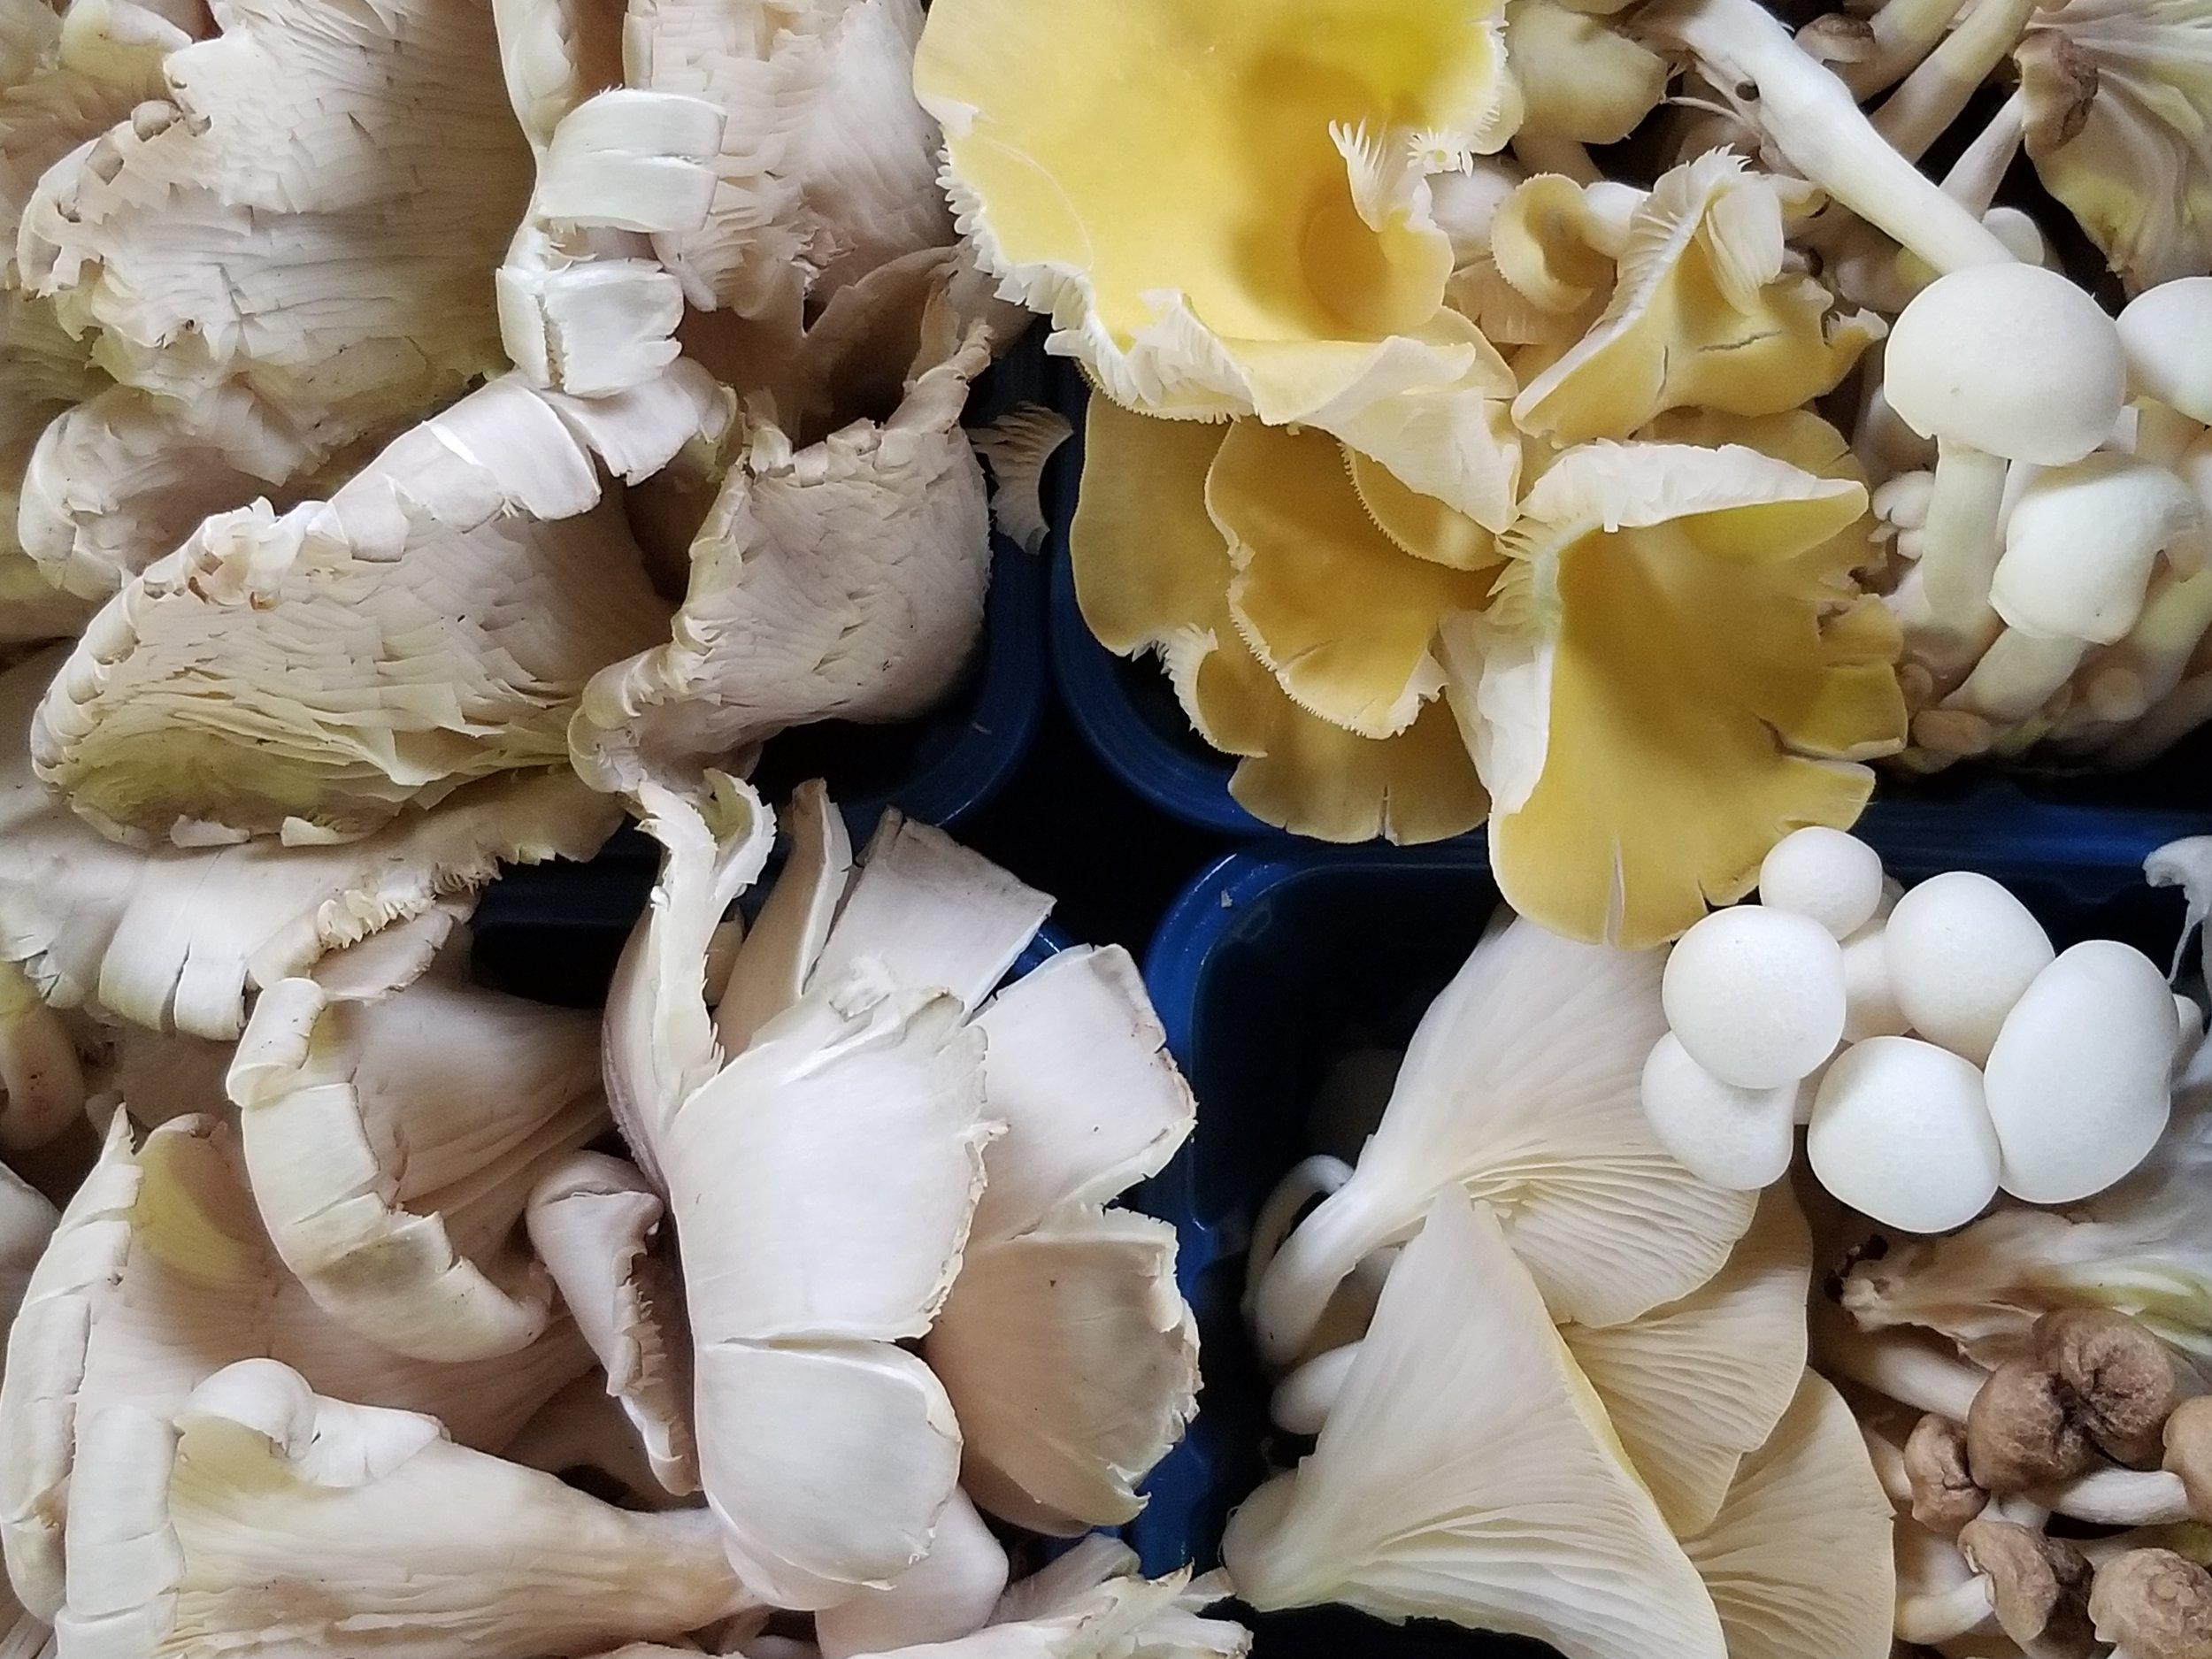 Baltimore's Farmer's Market blew me away - amazing wild mushrooms